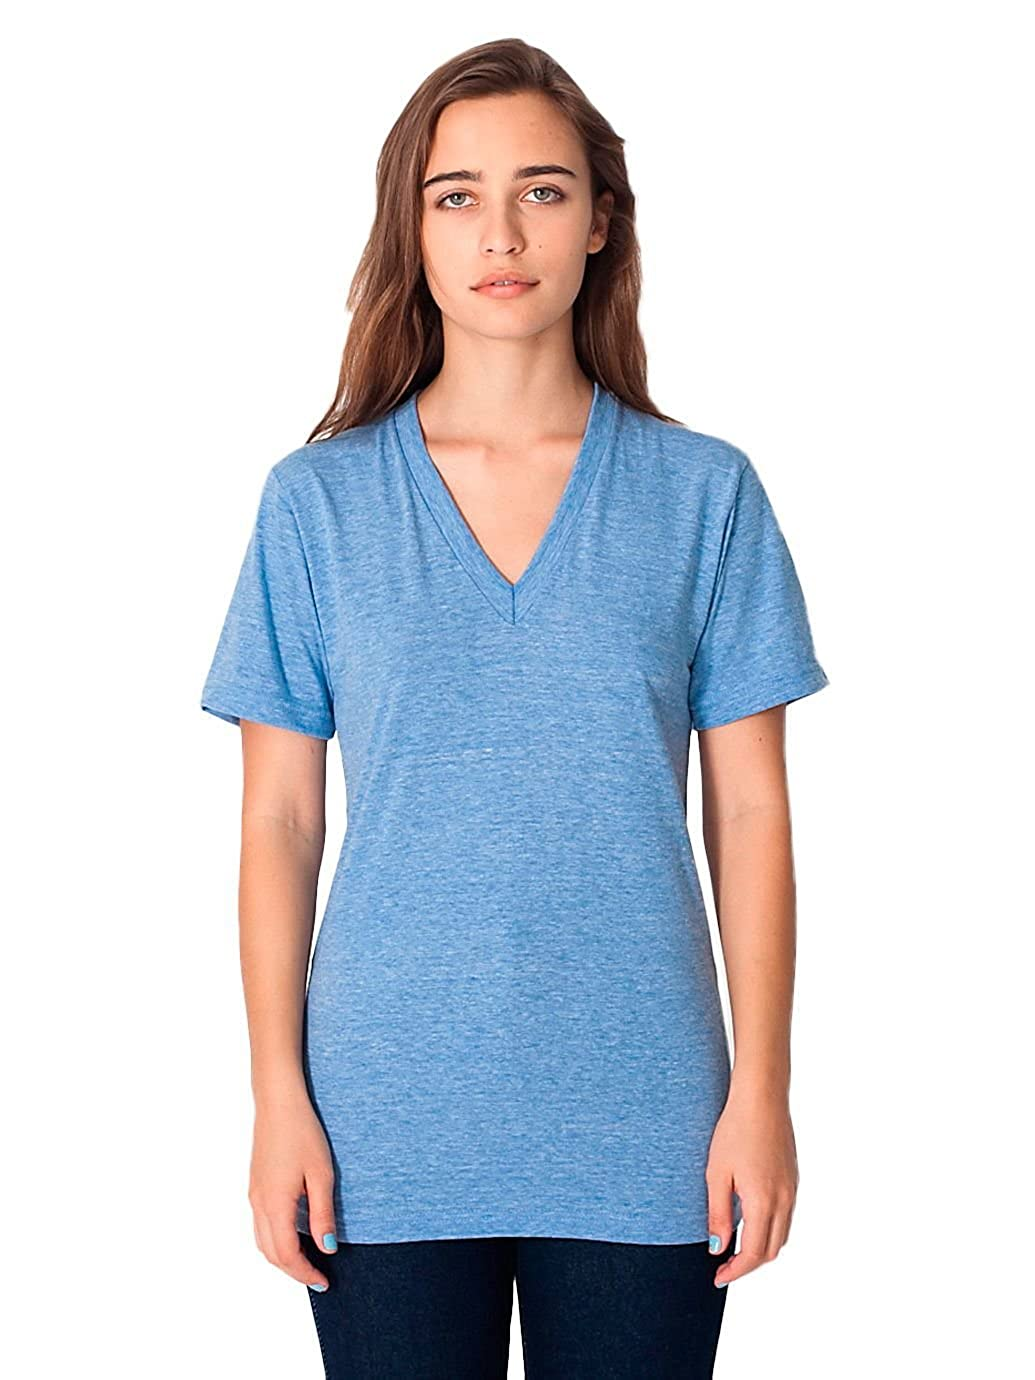 666533fa0 American Apparel Unisex Tri-Blend Short Sleeve V-Neck at Amazon Men's  Clothing store: